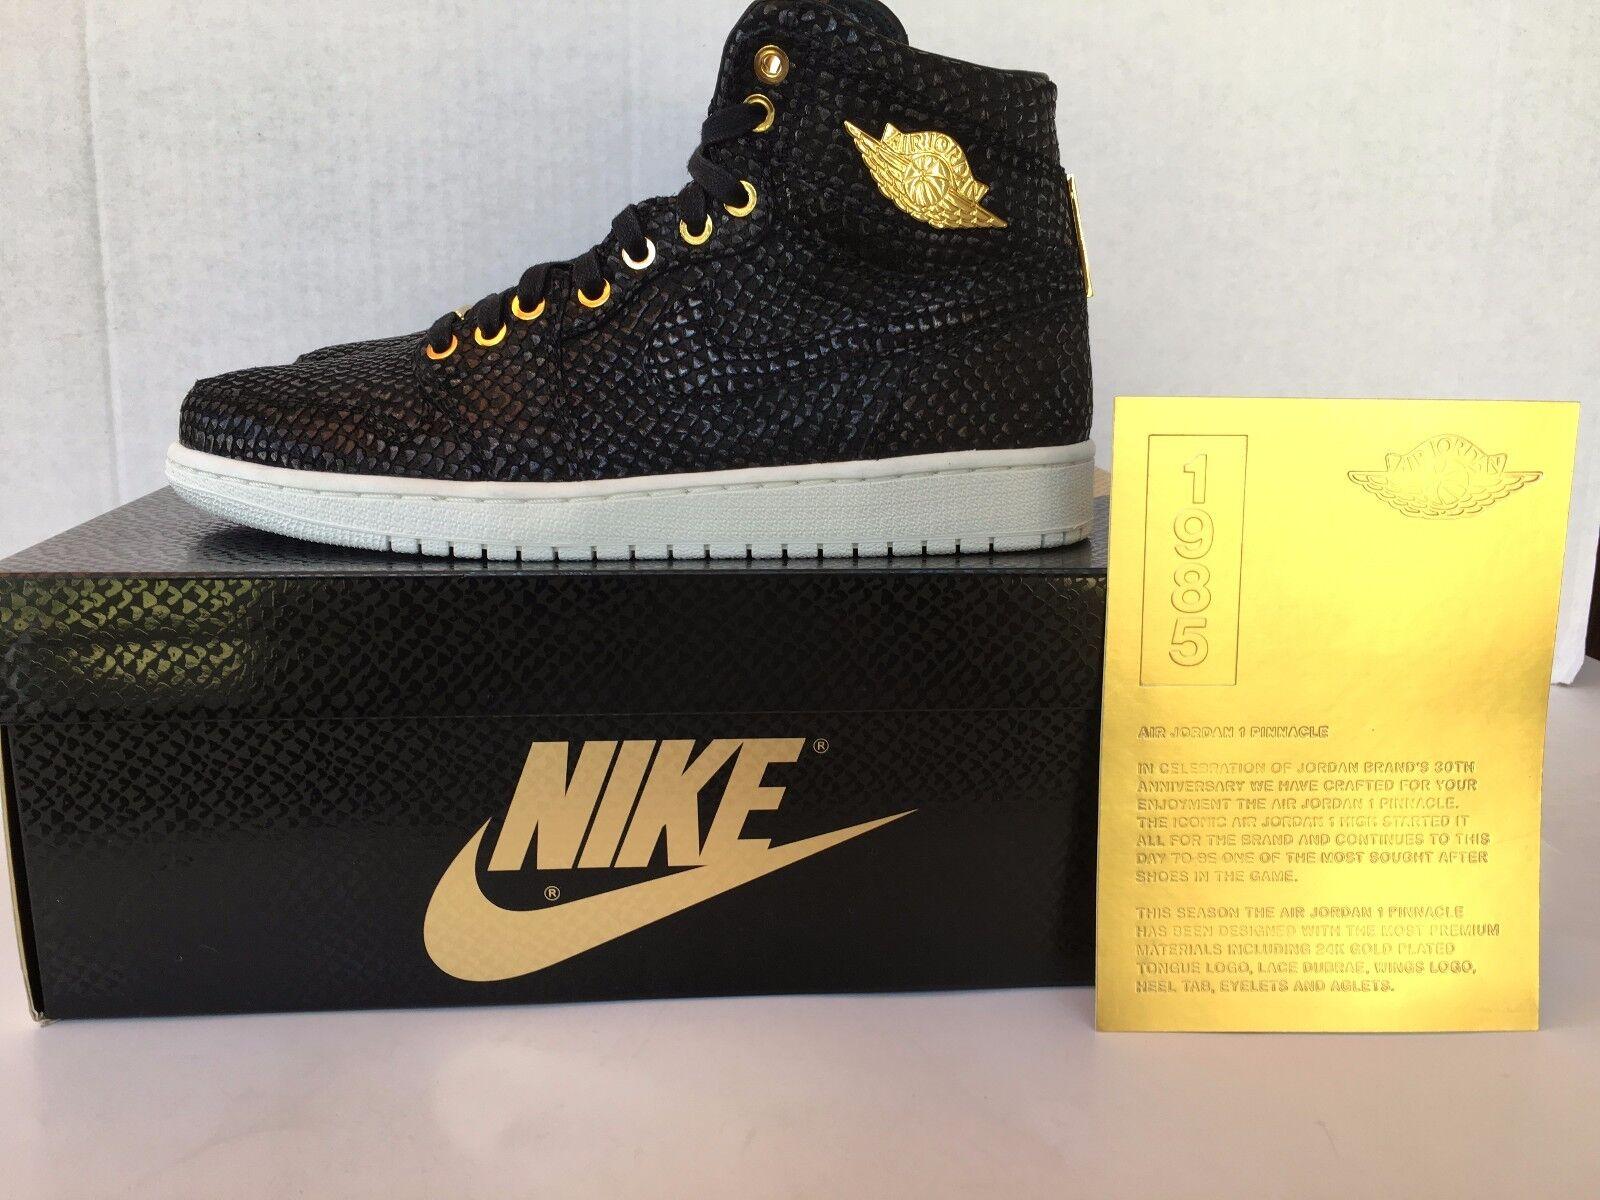 Nike Air Jordan 1 Pinnacle Black Metallic Gold 705075-030 Men's Size 14 New